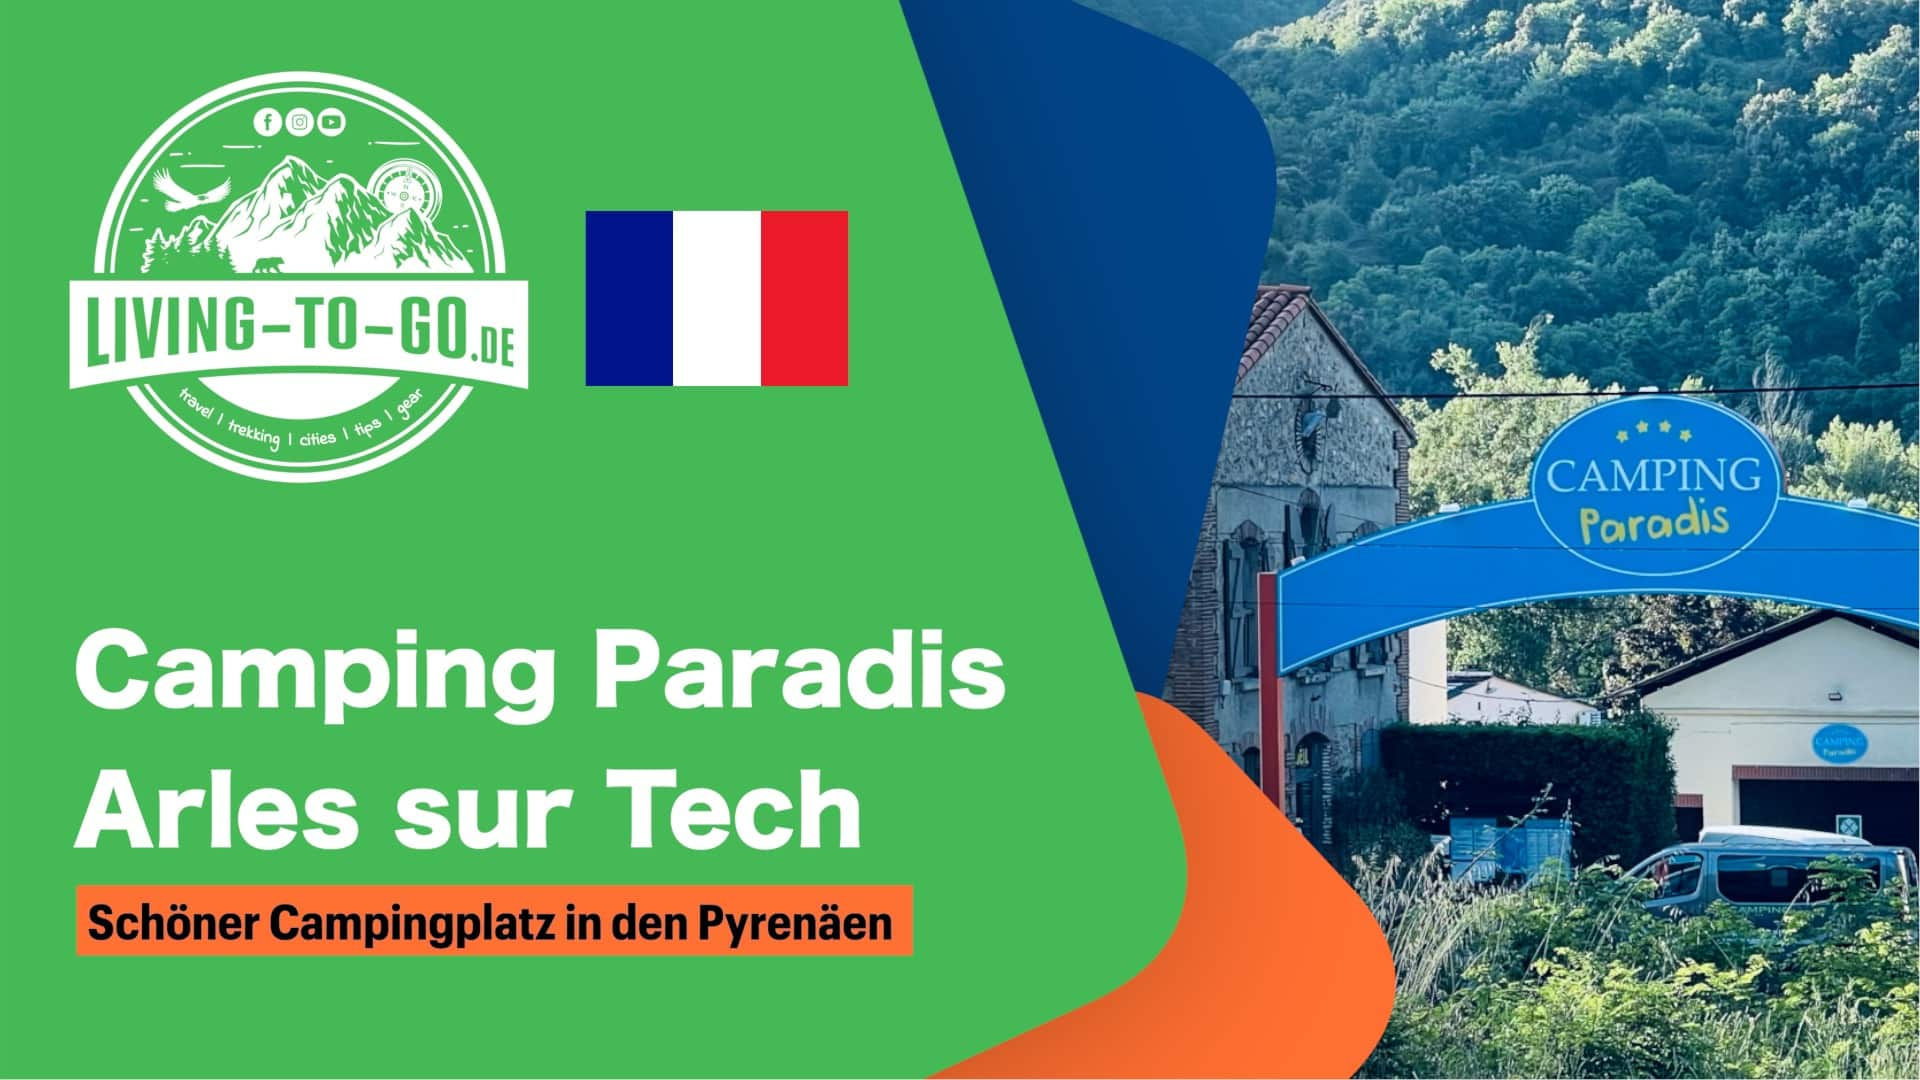 Camping Paradis Arles sur Tech Frankreich